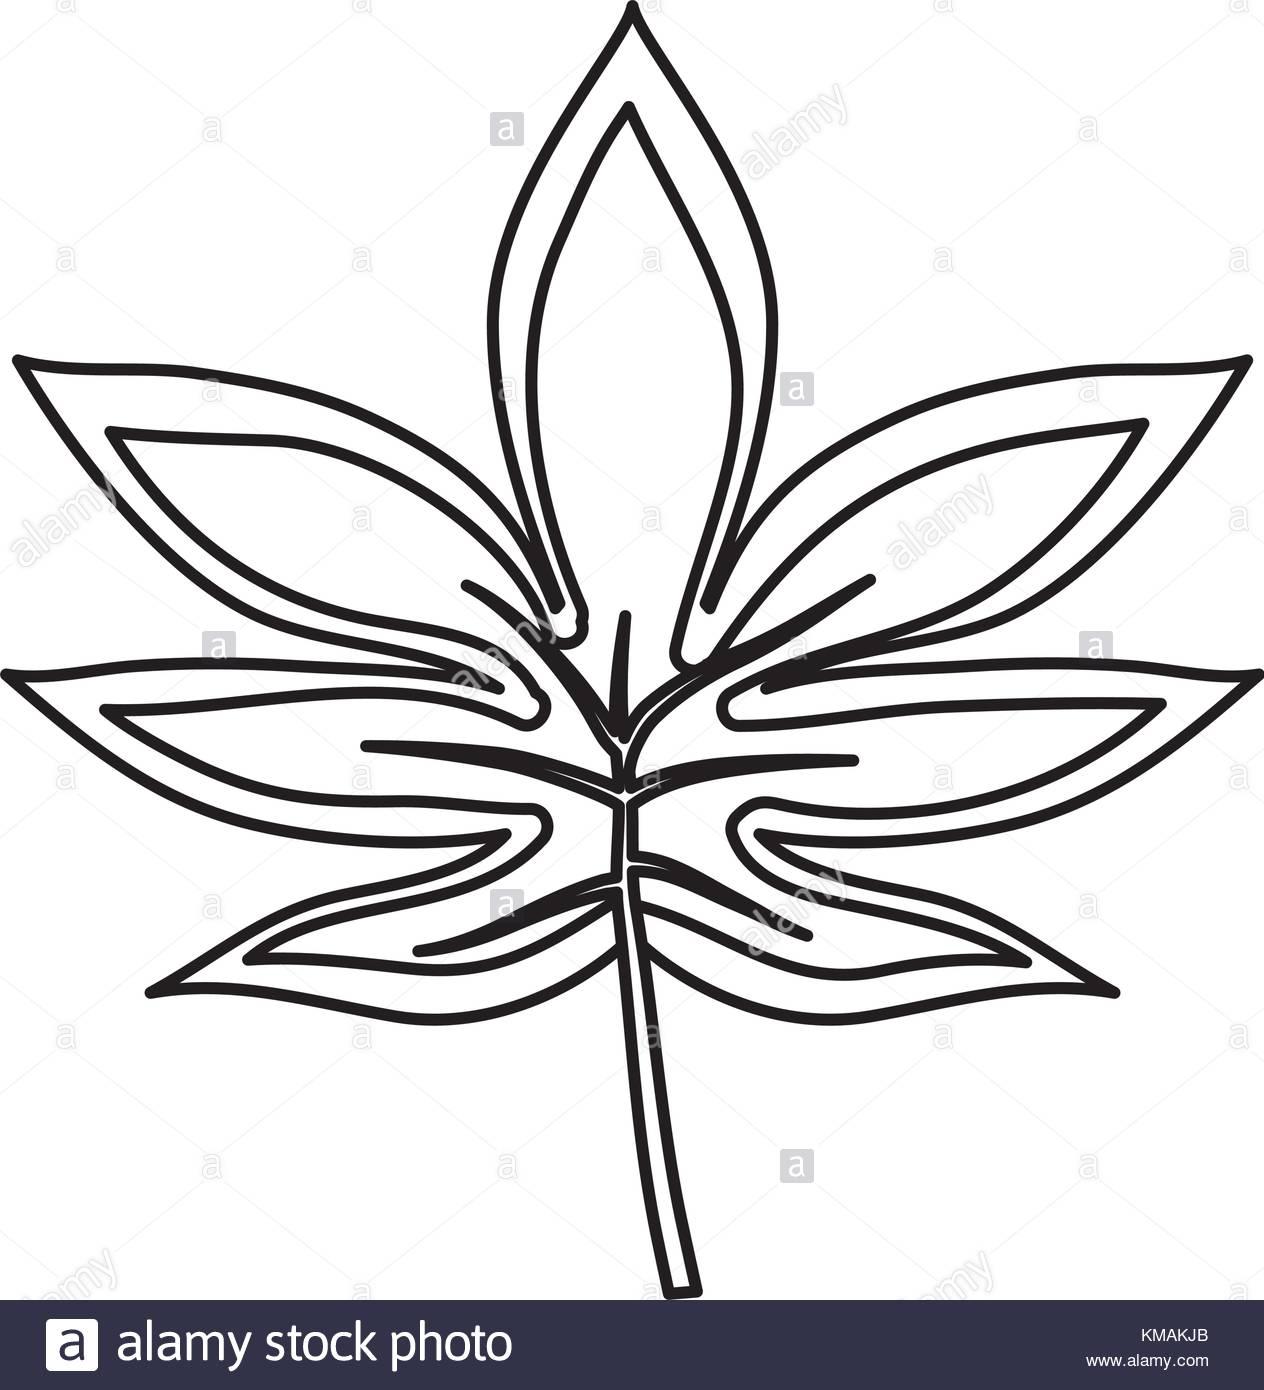 1264x1390 Tropical Leaves Design Stock Vector Art Amp Illustration, Vector